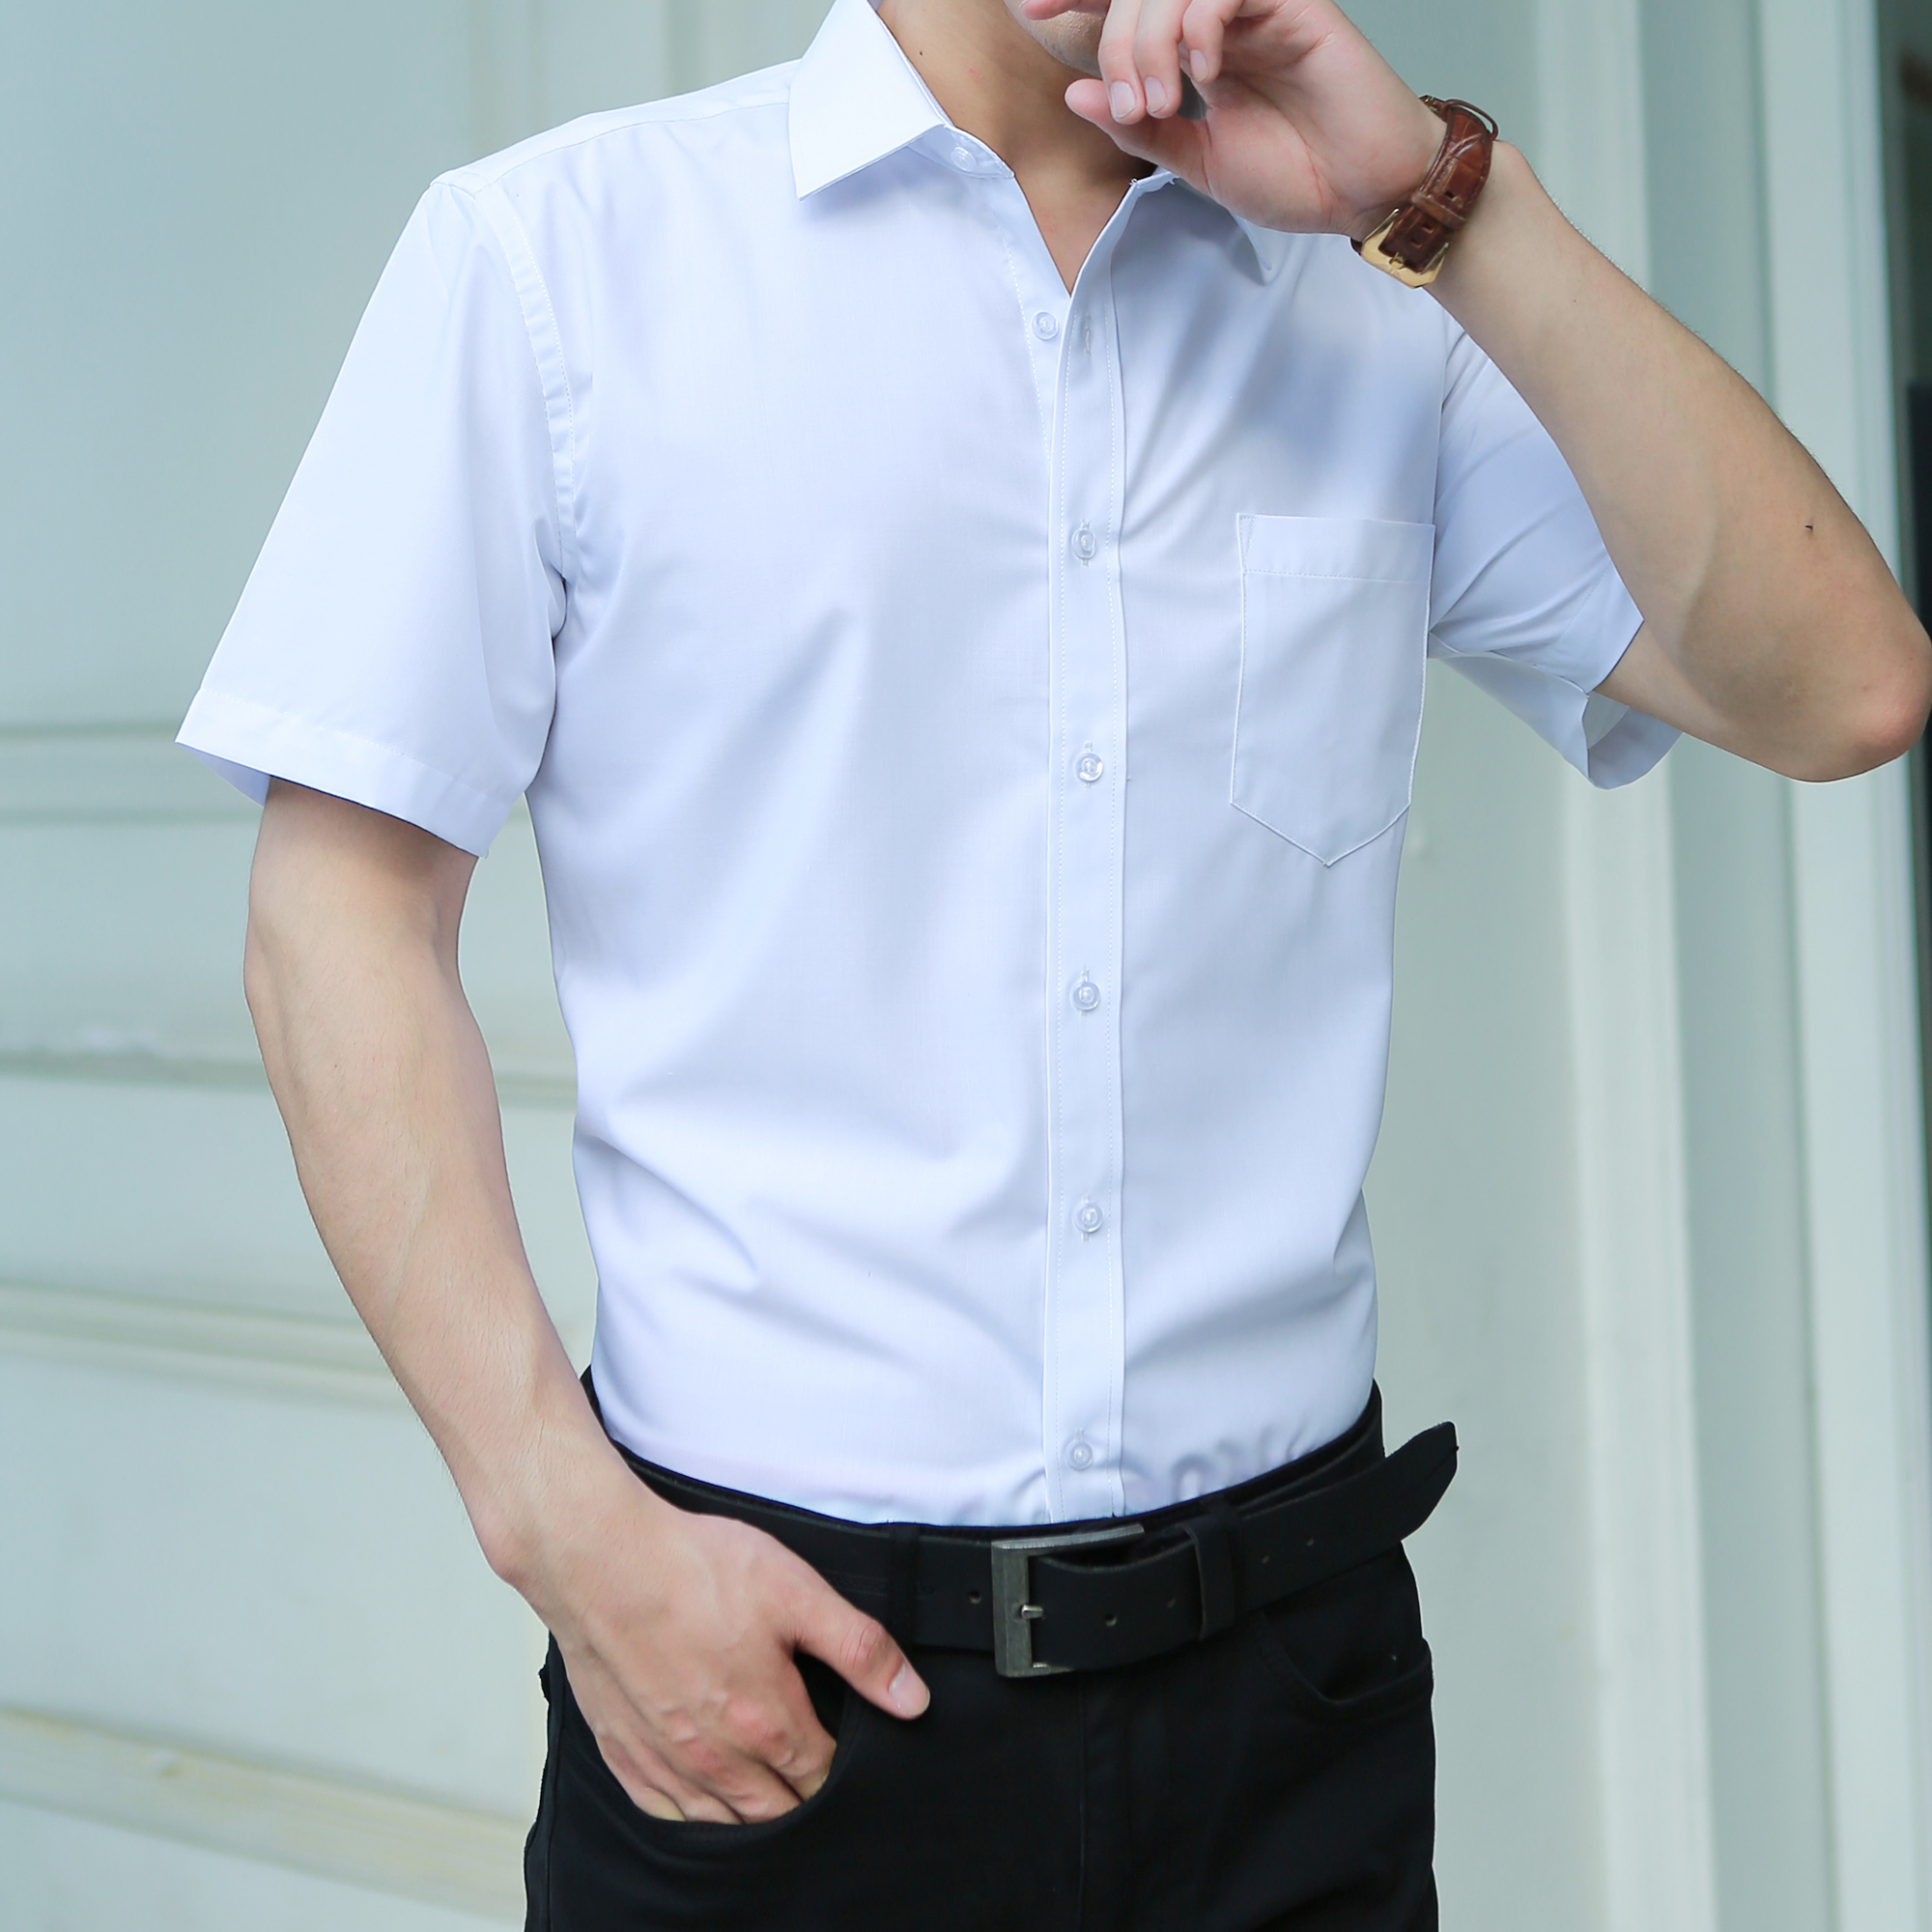 2019 Summer Short Sleeve Men Shirt Increase Fertilizer Solid Color Casual Slim Fit Tops Plus Size Hot Sale